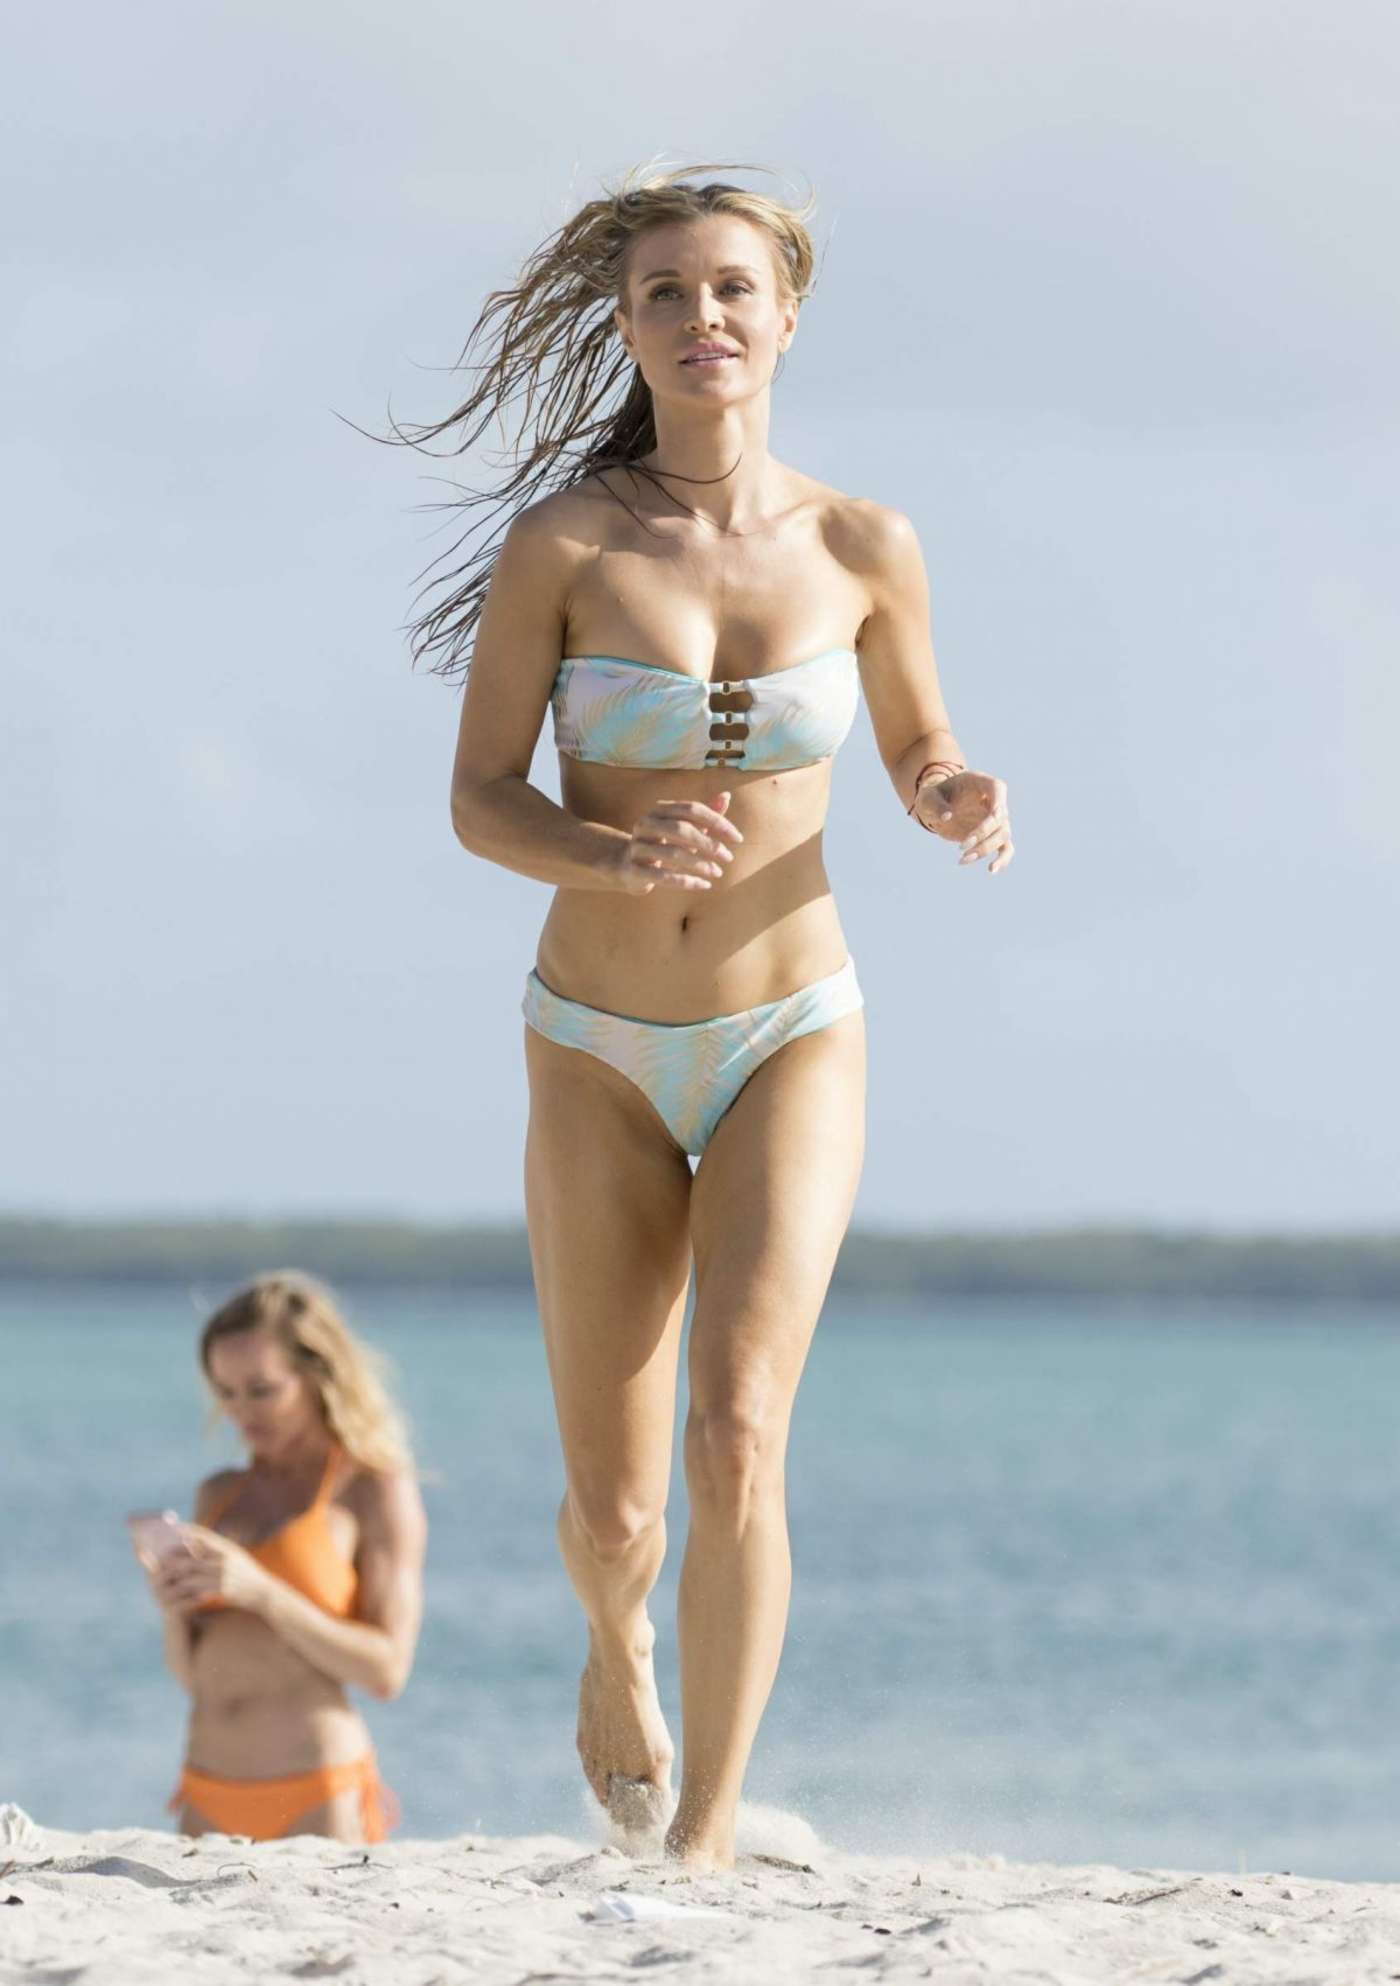 Celebrites Joanna Krupa Body nudes (36 photo), Topless, Cleavage, Twitter, bra 2019